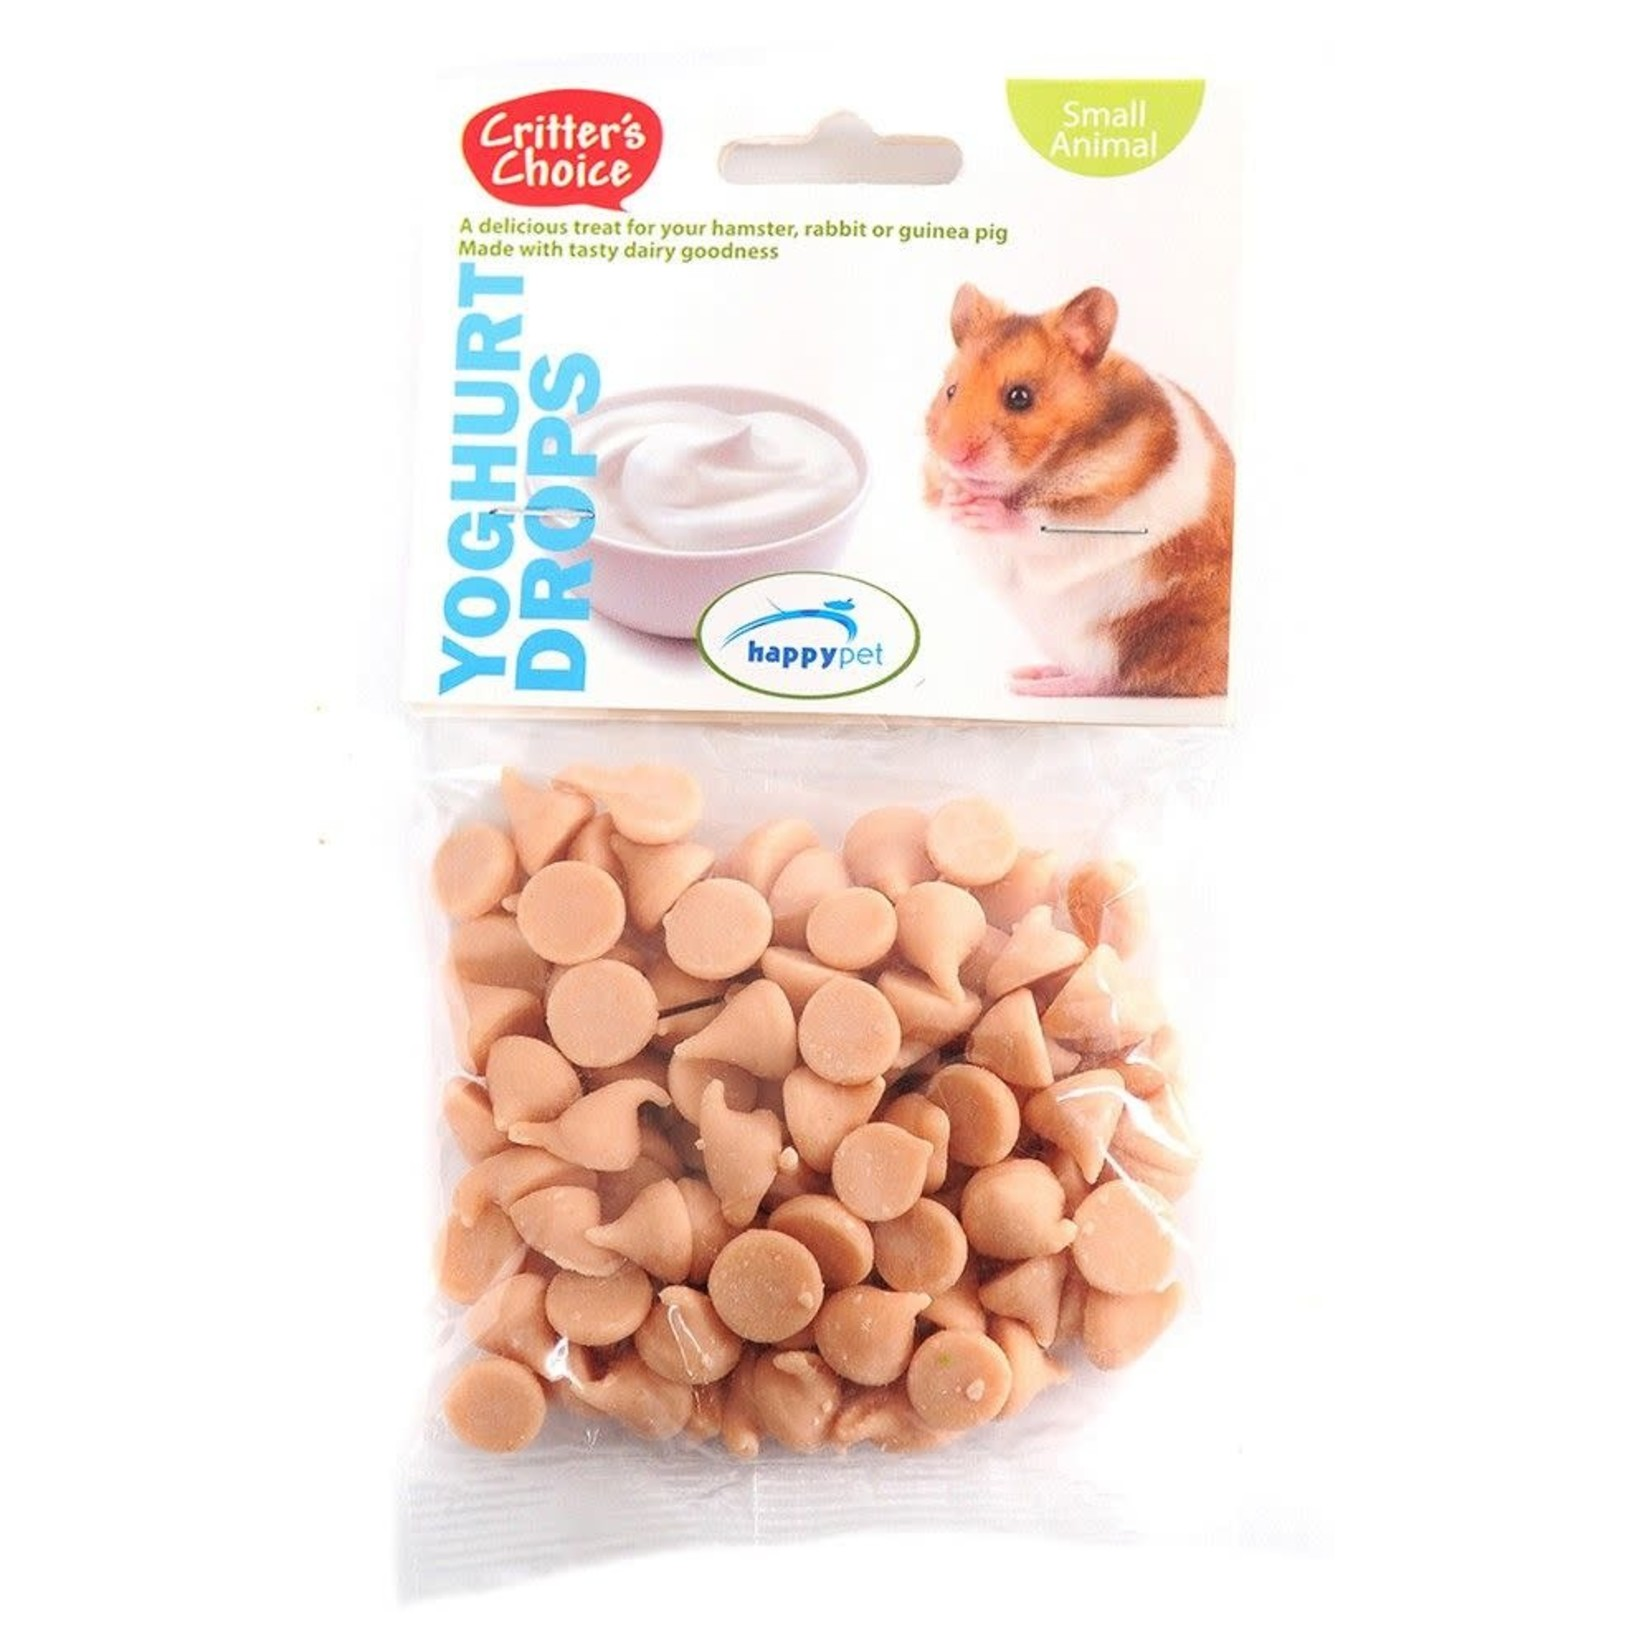 Happy Pet Critter's Choice Small Animal Treats Yoghurt Drops, 75g